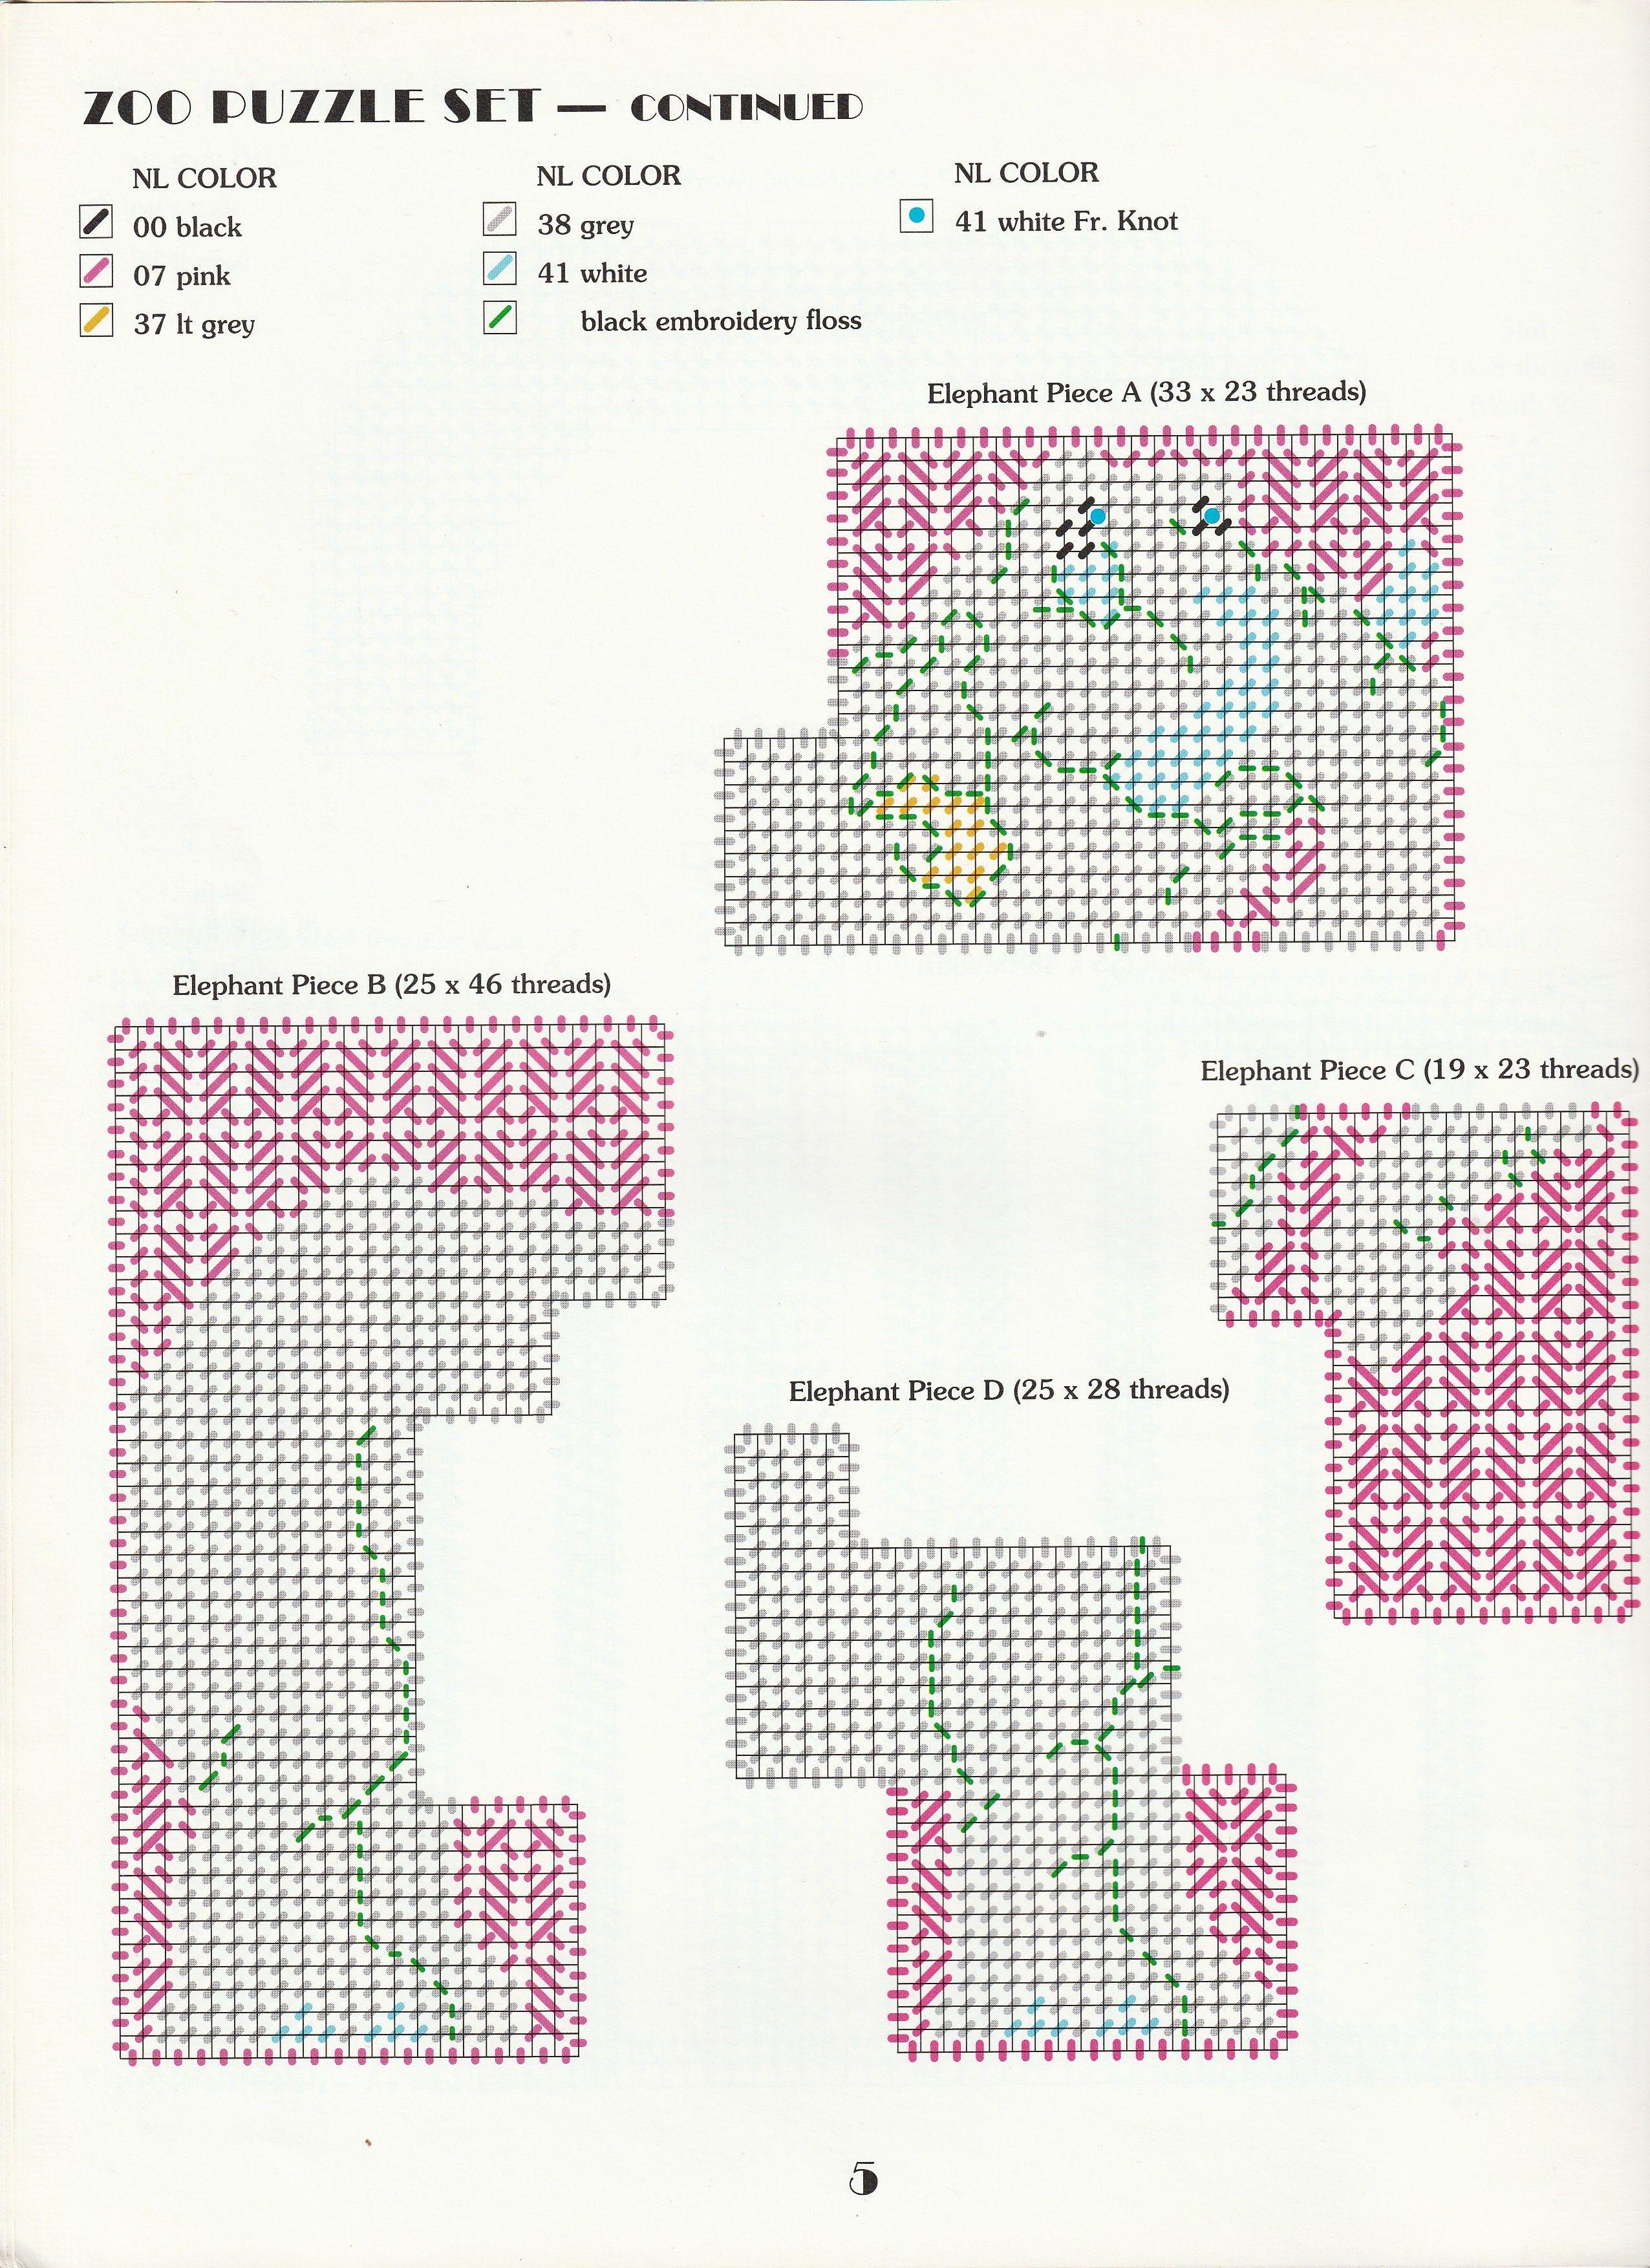 BARNFUL OF PUZZLES  ~  plastic canvas pattern  ~  Leisure Arts pattern